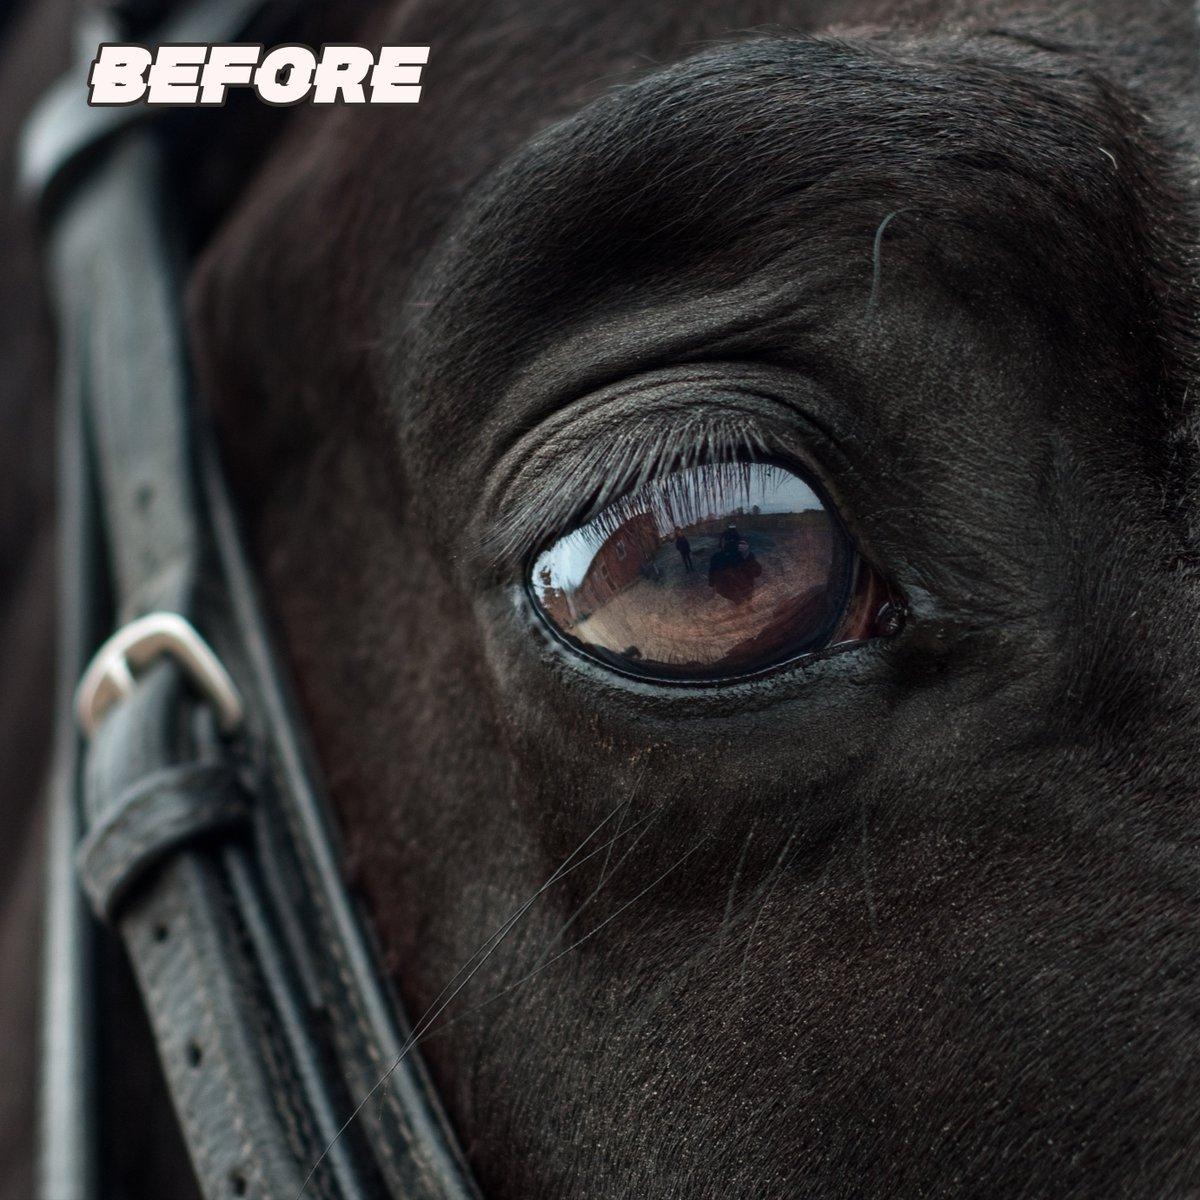 Horse eye 🌌🐴 -----  ------ #photoshopedit #photoshoptouch #photoshop #neon #instadaily #likeforlikes #love #instalove #glow #eyes #art #creative #addiction #fire #ads #space #photography #photooftheday #lightroom #vsco #picsartedits #picsart #horse